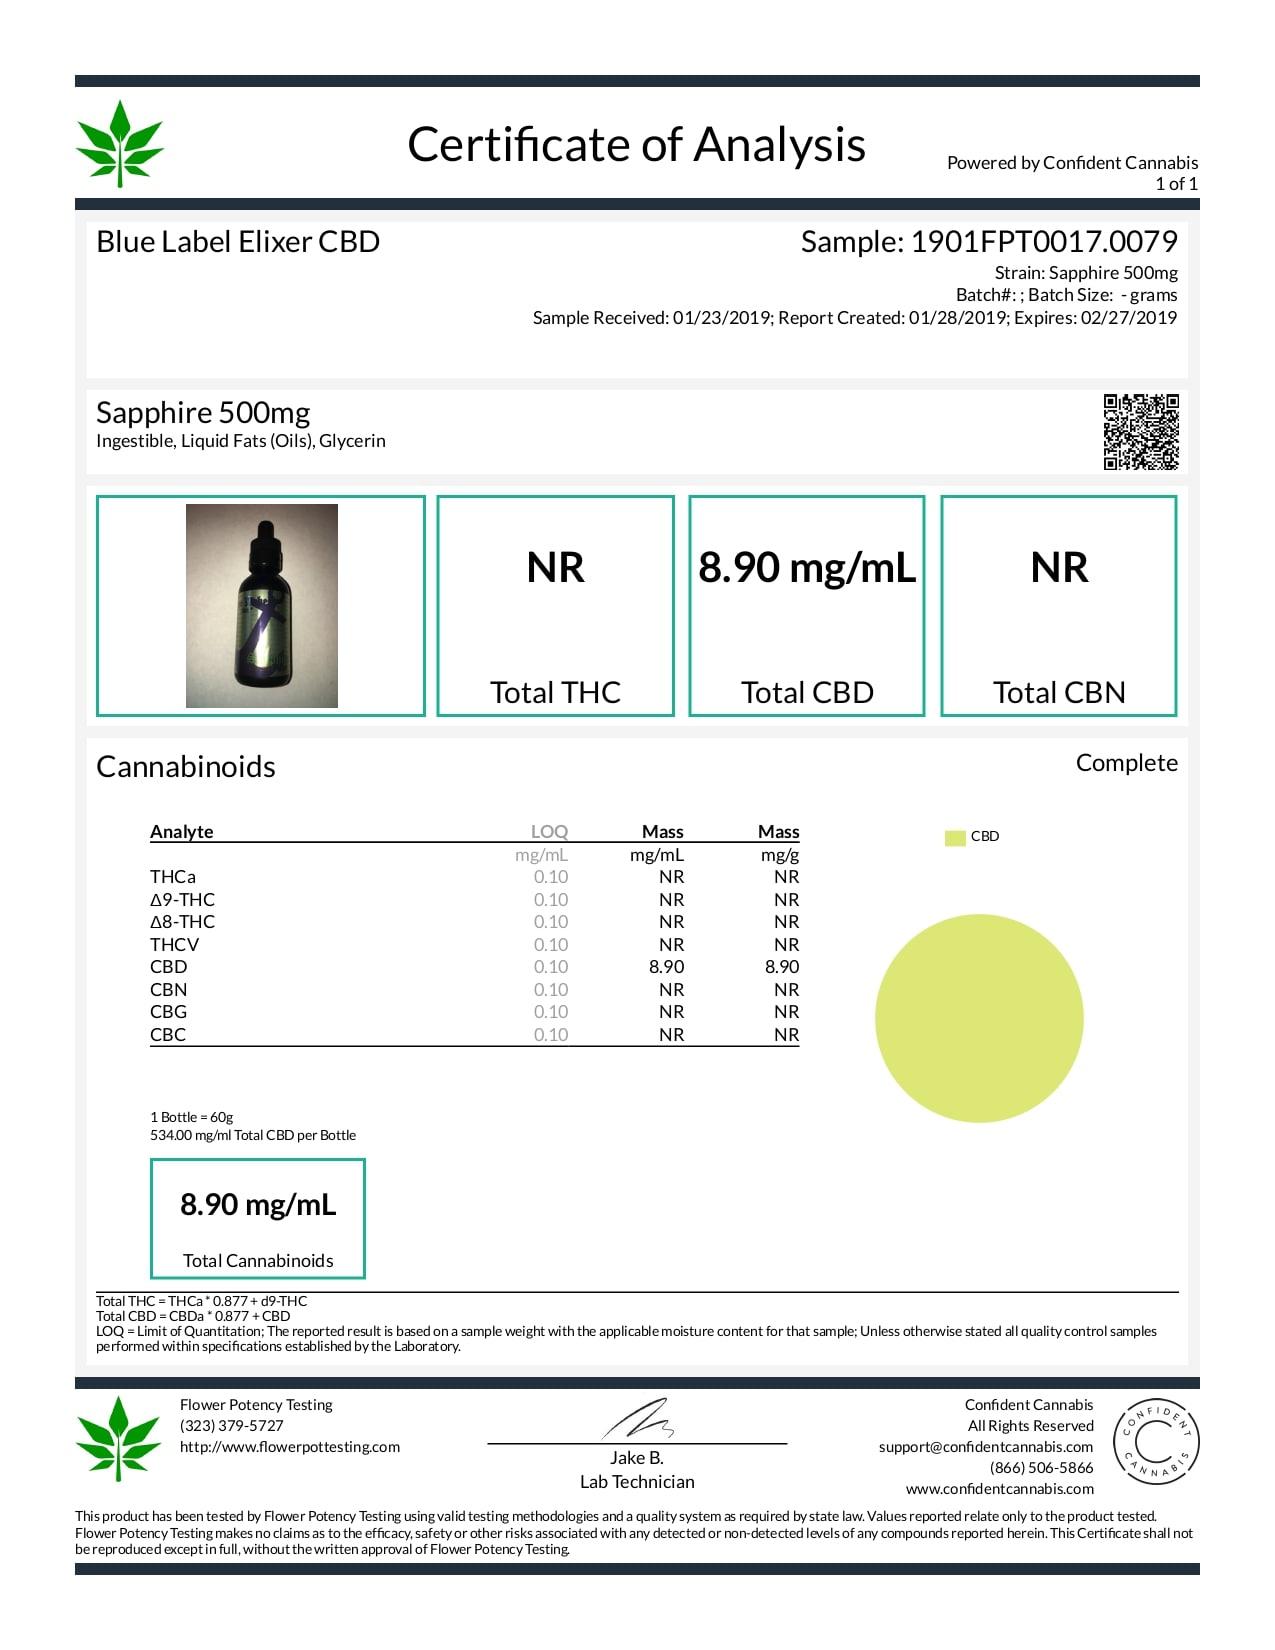 Blue Label CBD Vape Juice Sapphire 500mg Lab Report